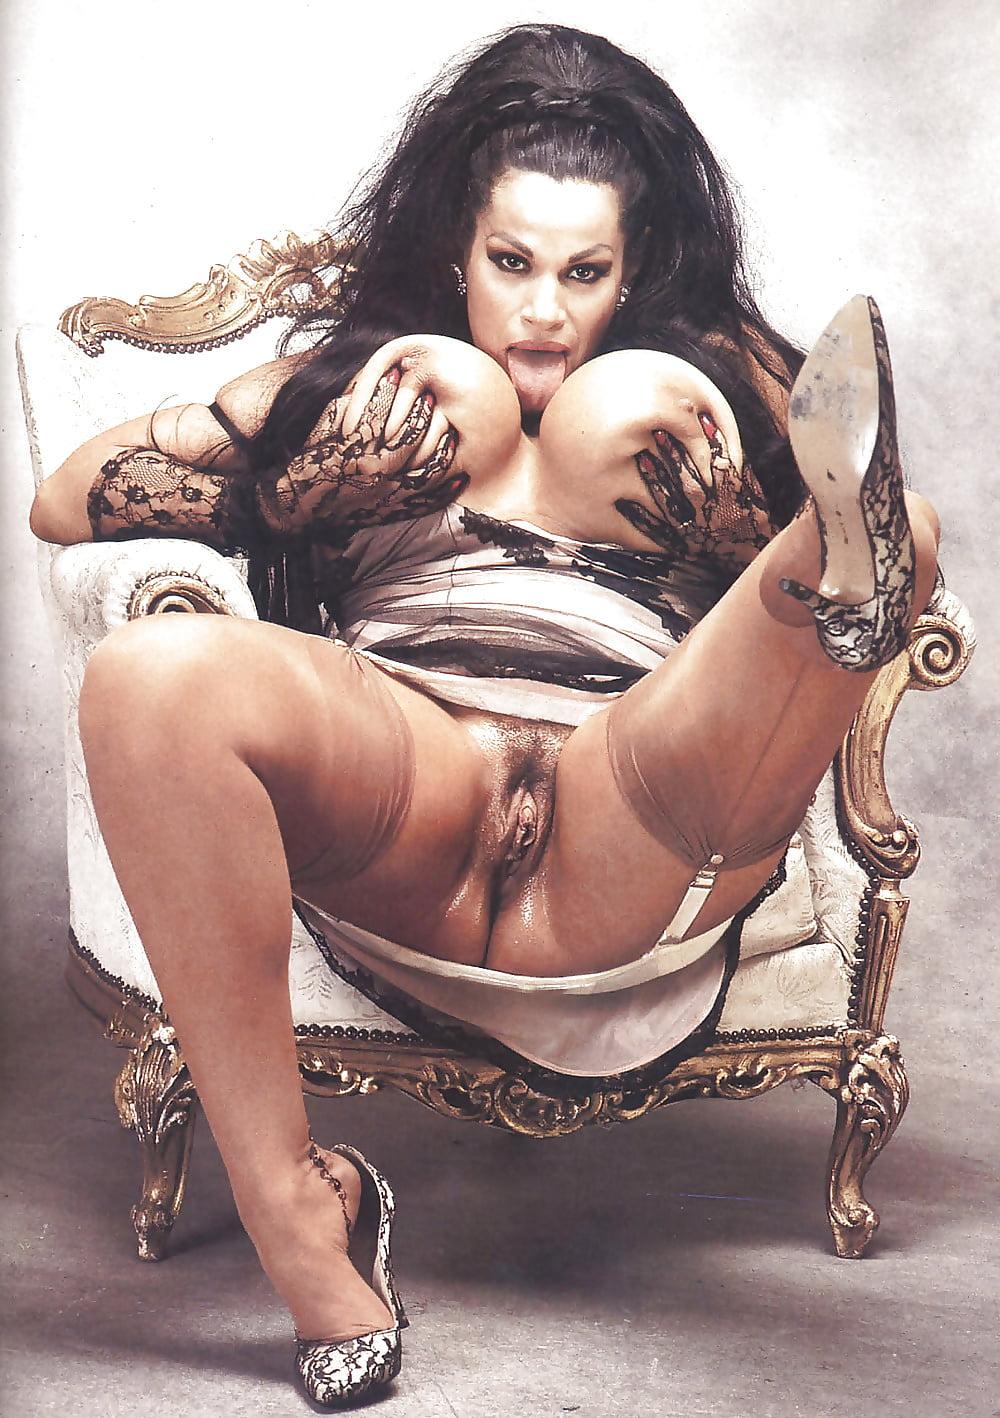 free-vanessa-del-rio-first-anal-playboy-nudebigtiys